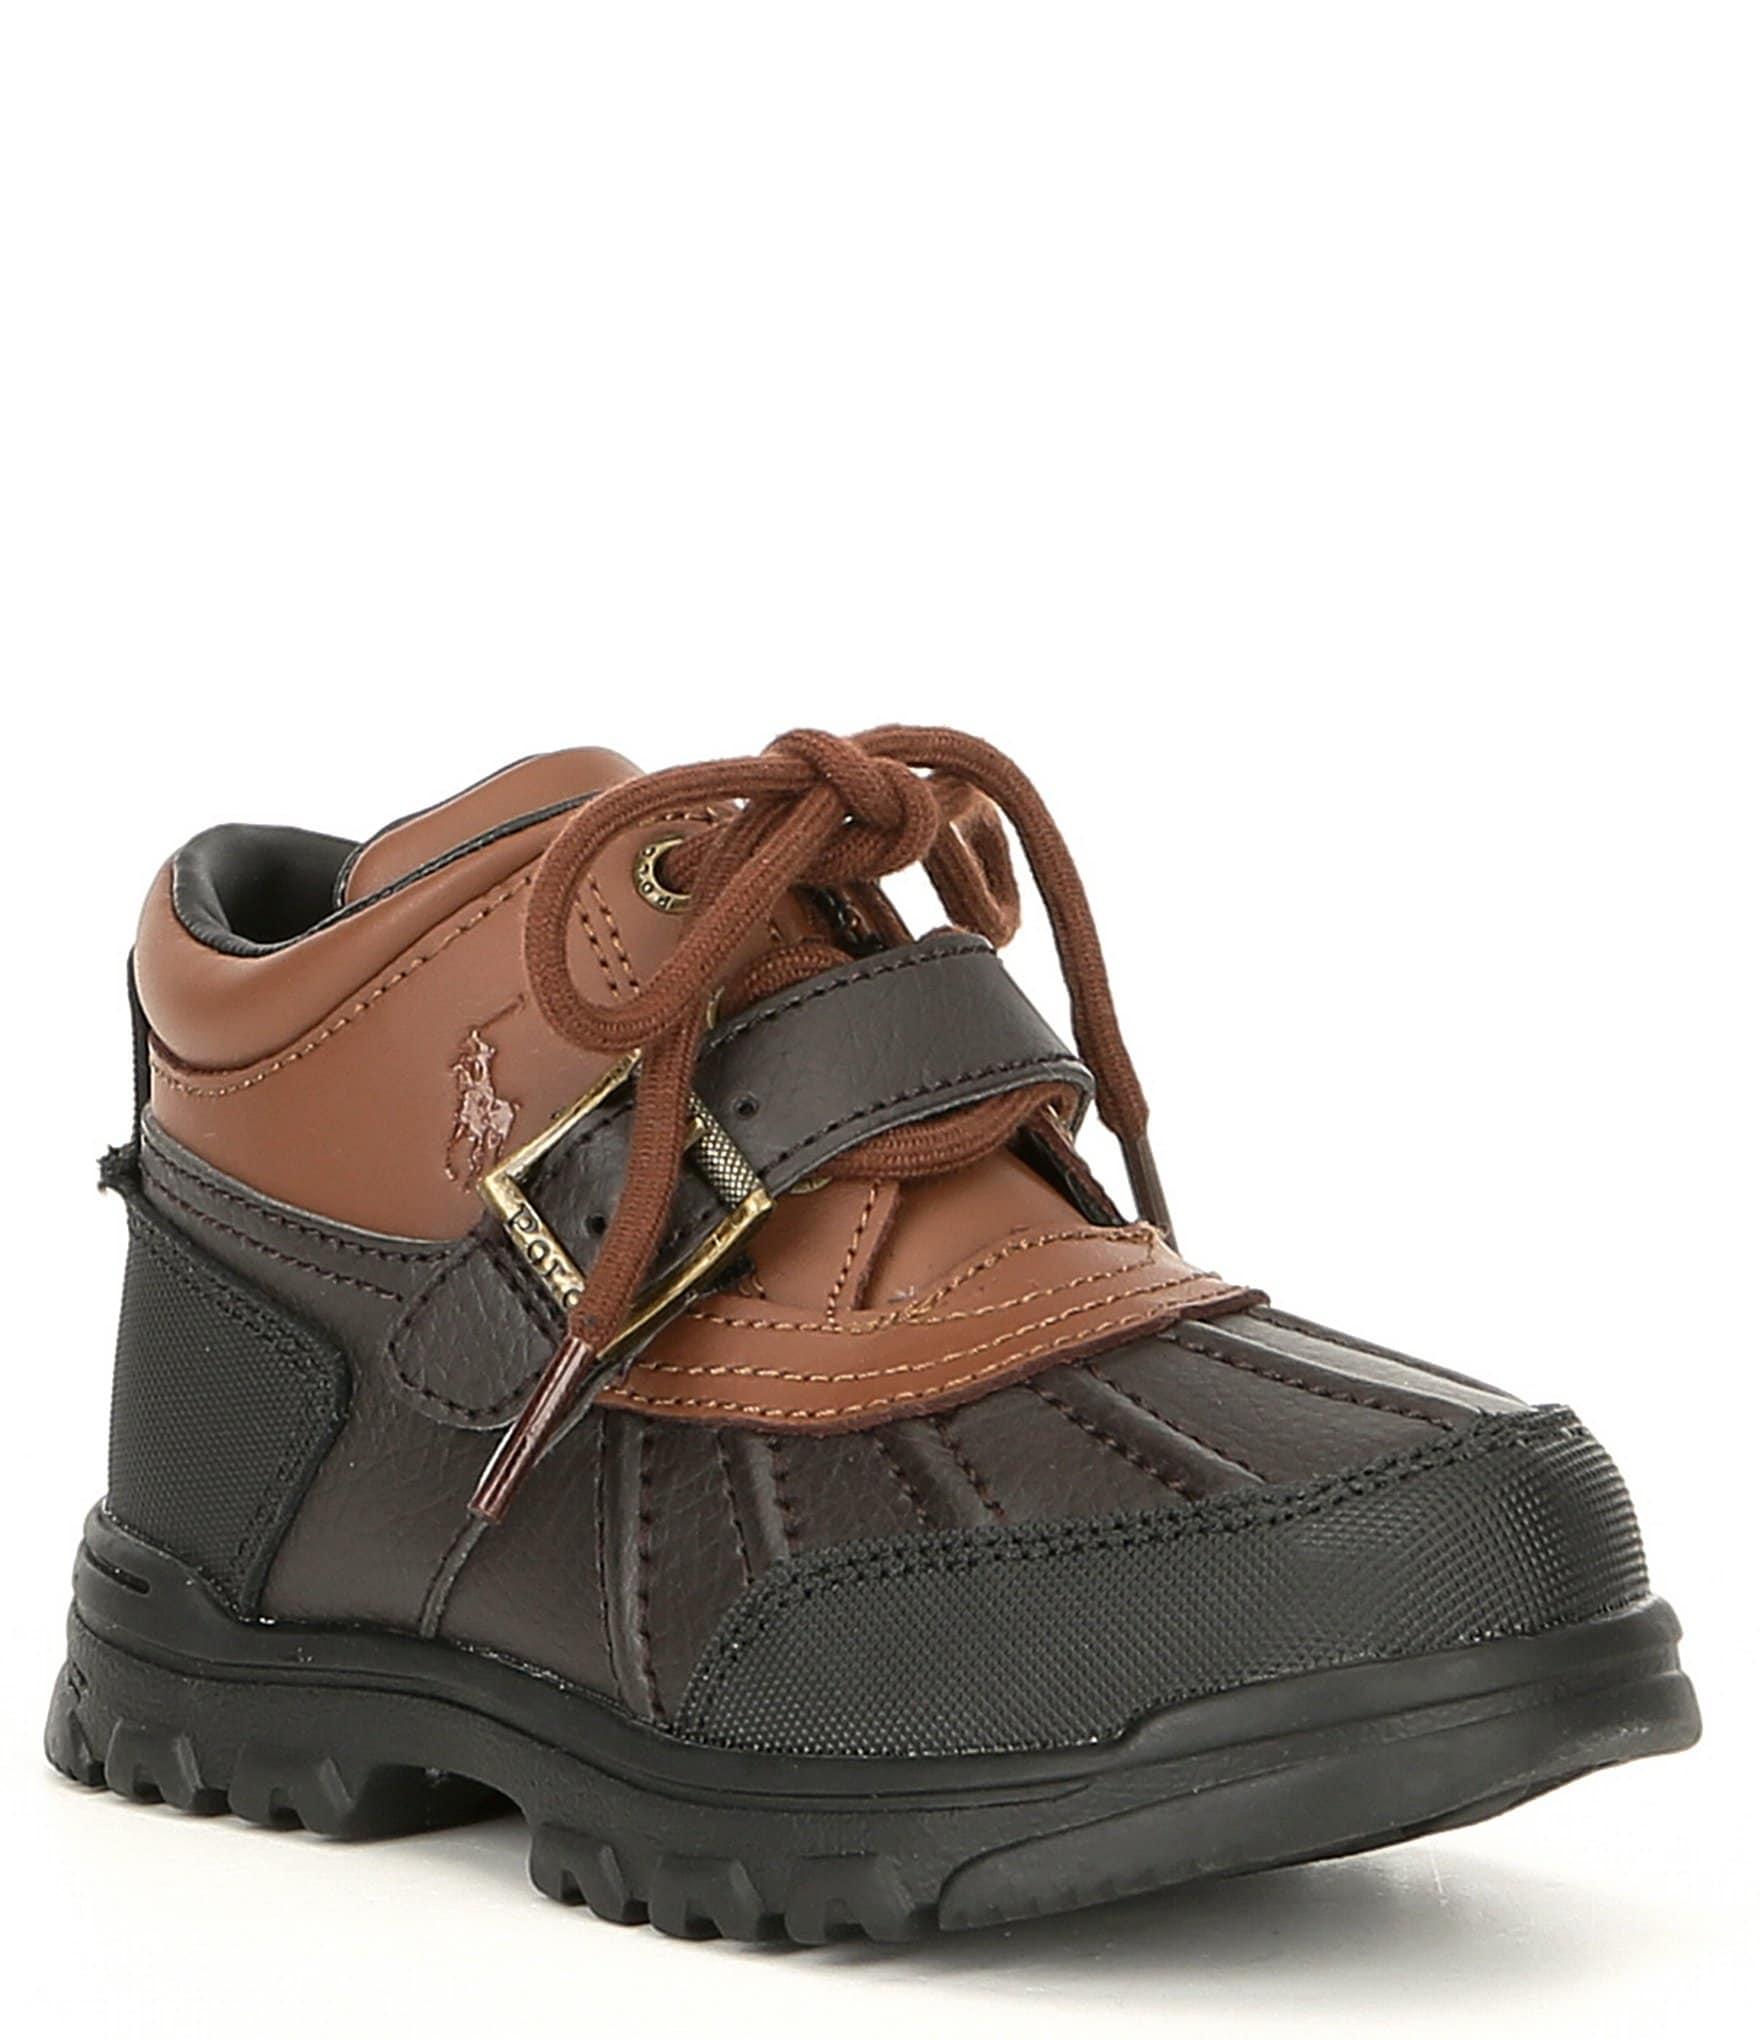 polo short: Shoes | Dillard's